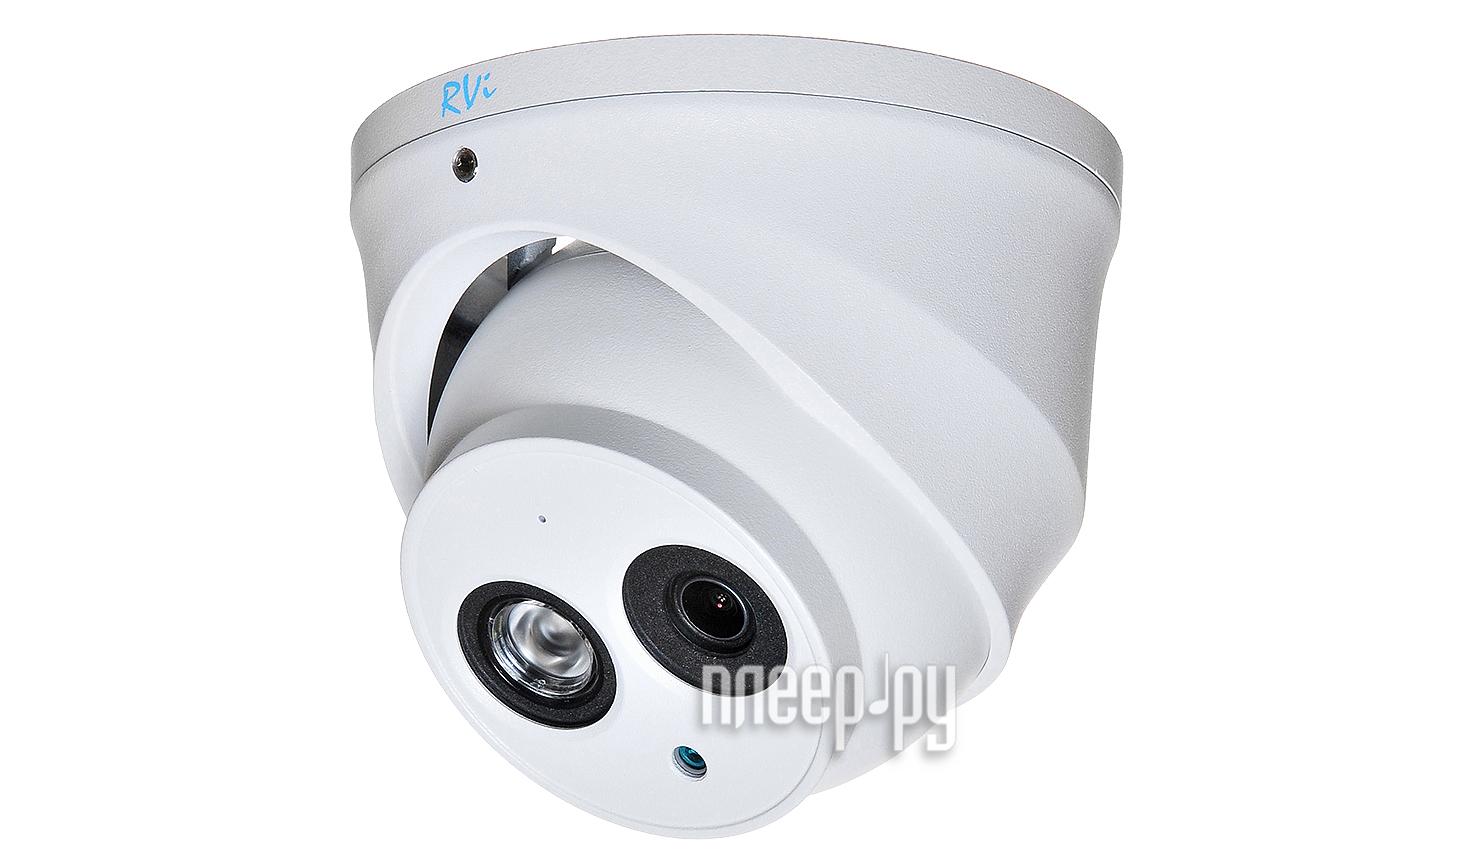 IP камера RVi RVi-IPC34VD 2.8mm